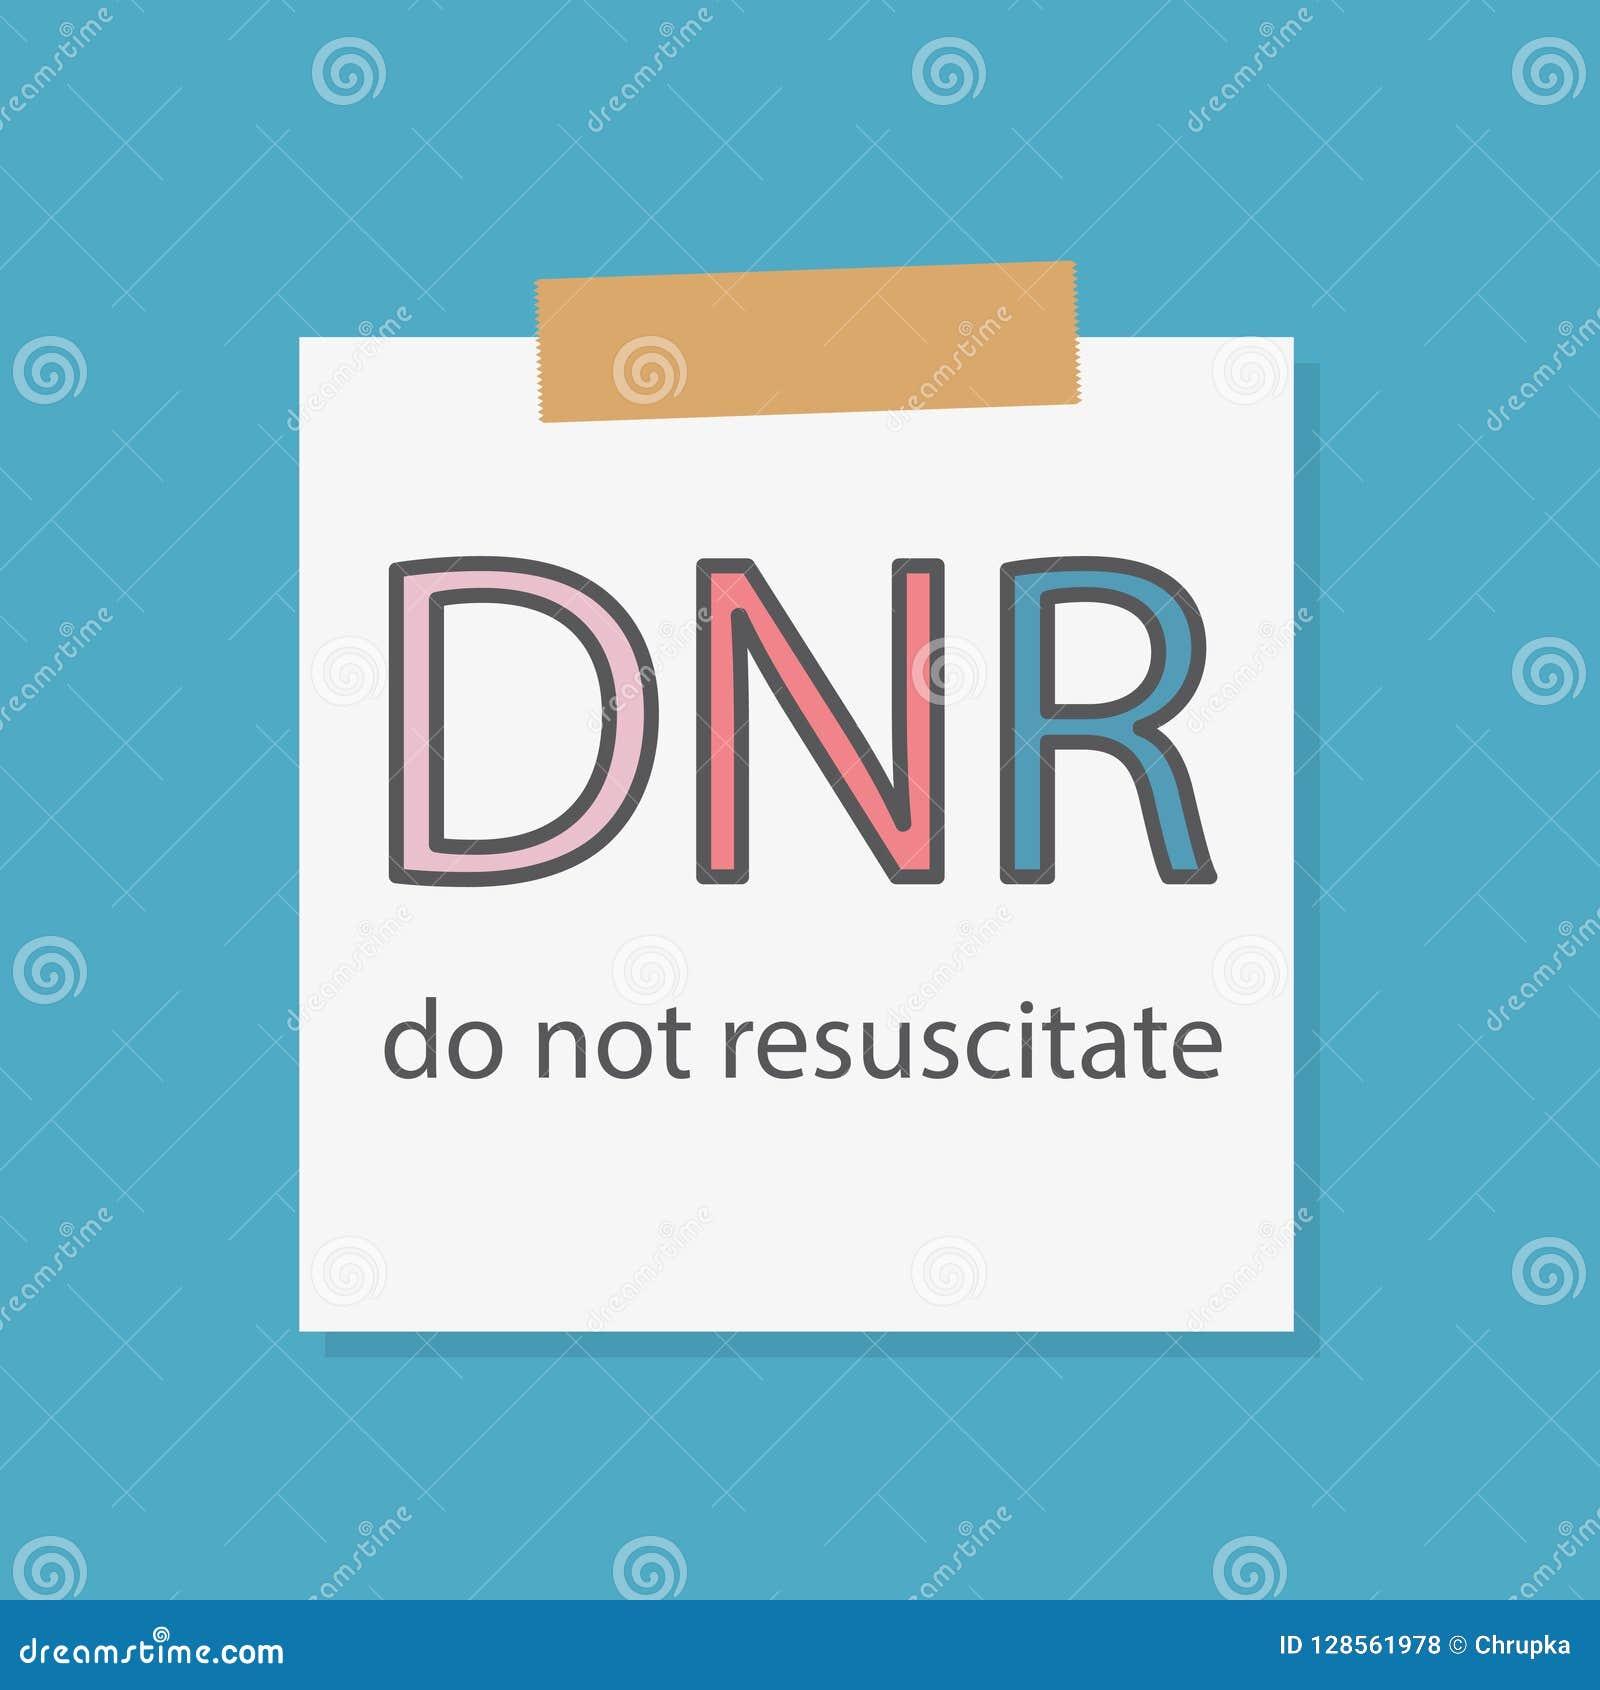 Dnr thesis statement